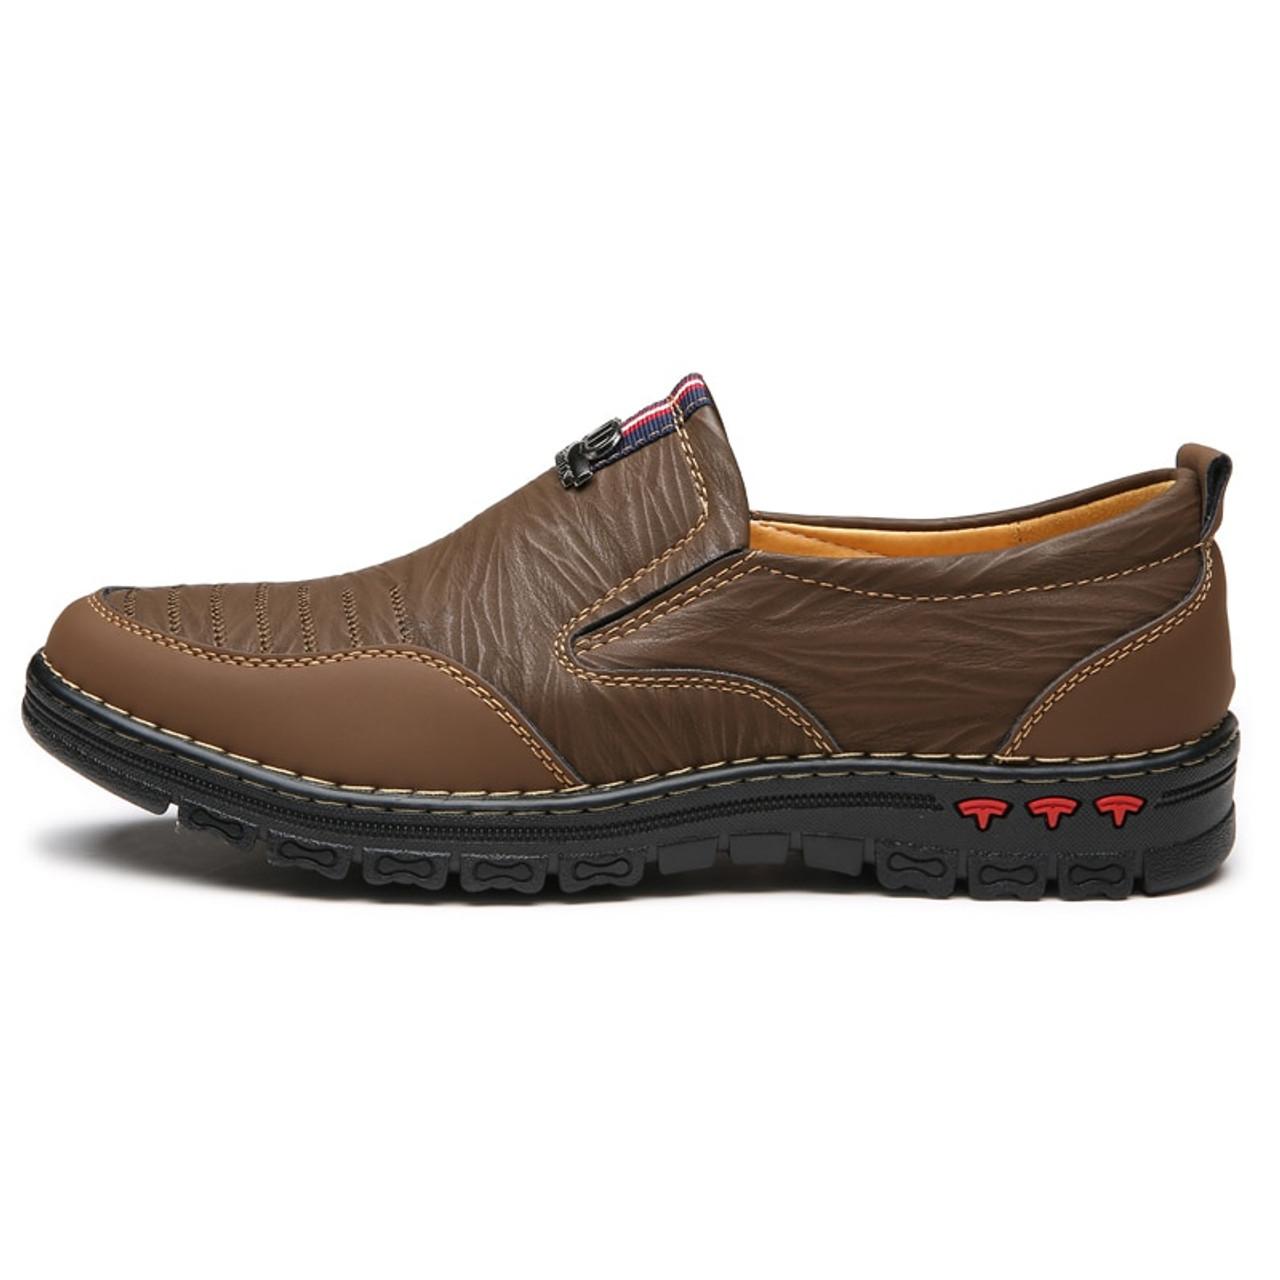 ... 2018 Spring Split Leather Casual Shoes Men Loafers Slip-On Men Shoes  Flats Comfortable Men ... 9e295630ede0